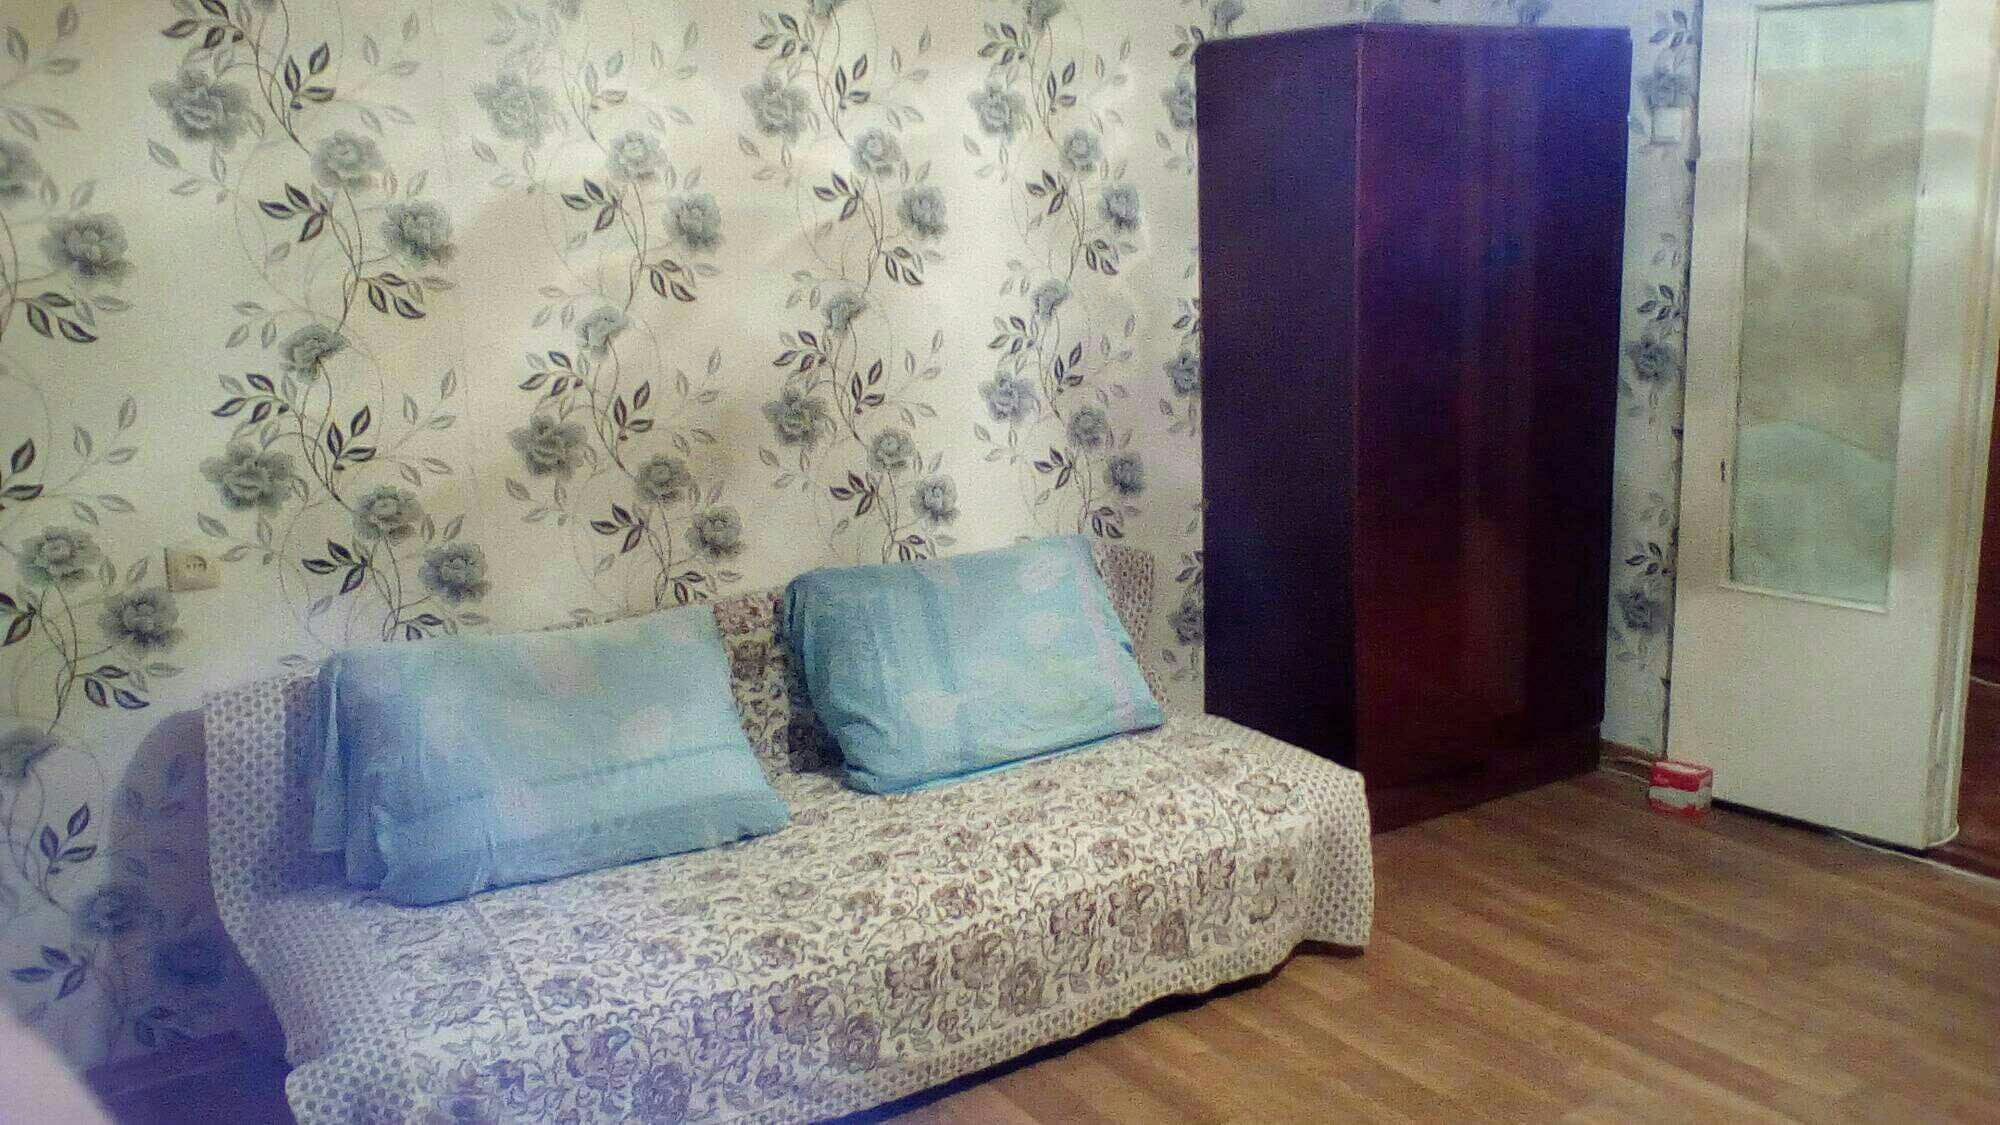 2к квартира Судостроительная улица, 177А | 15000 | аренда в Красноярске фото 1